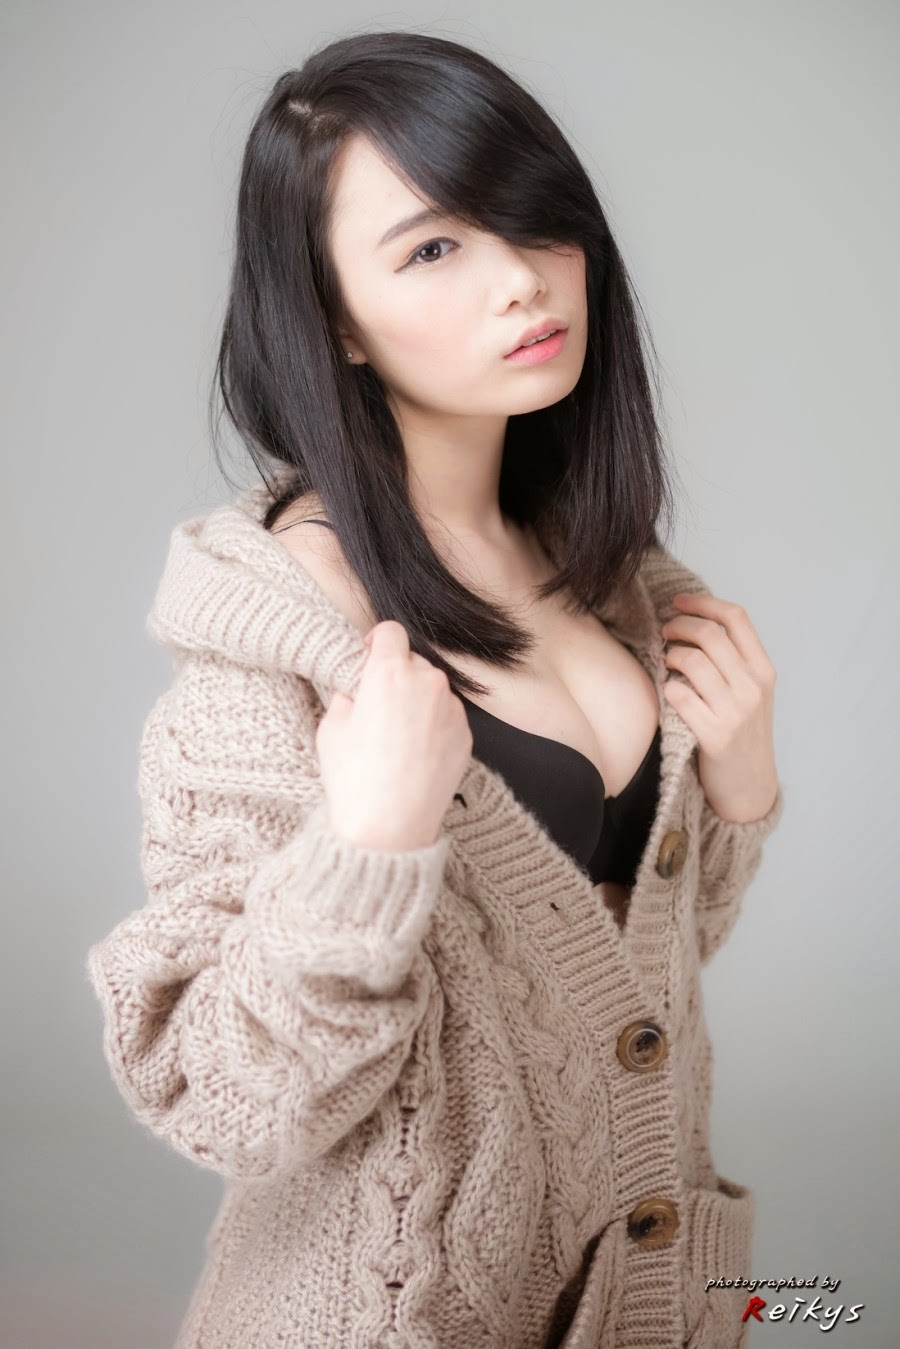 3 Na Ra - very cute asian girl-girlcute4u.blogspot.com